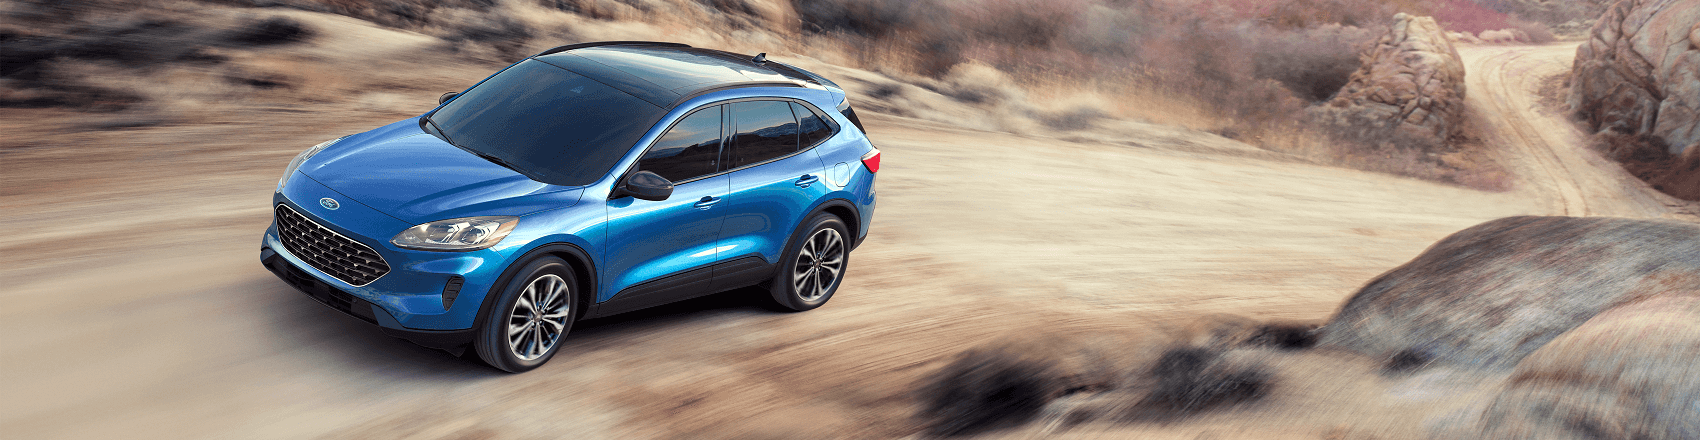 Ford Escape Off-Road Capability